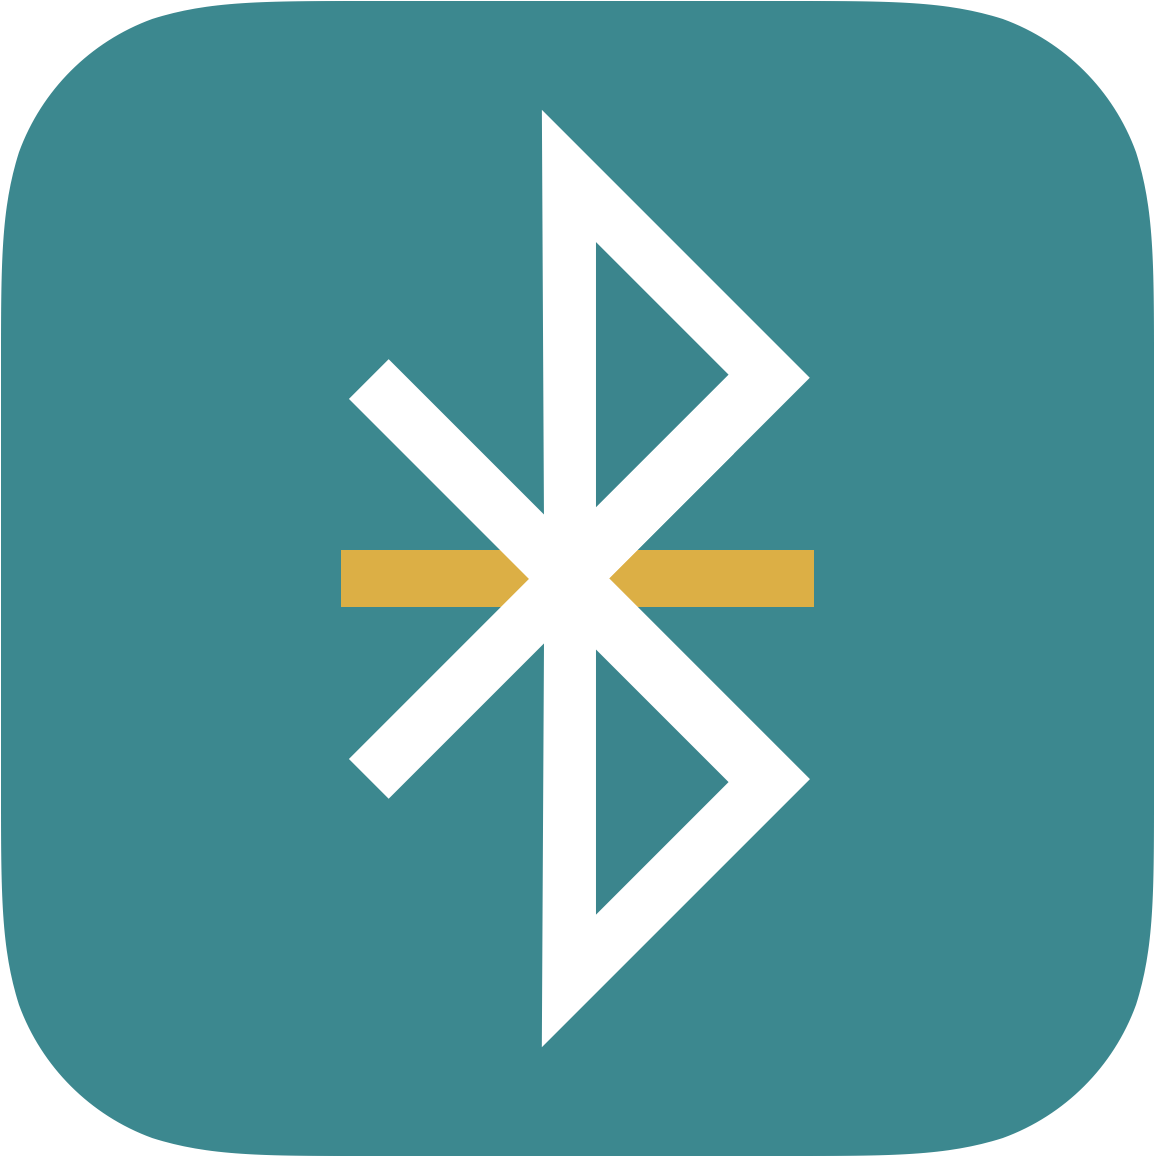 BLExAR_logo_rounded.png